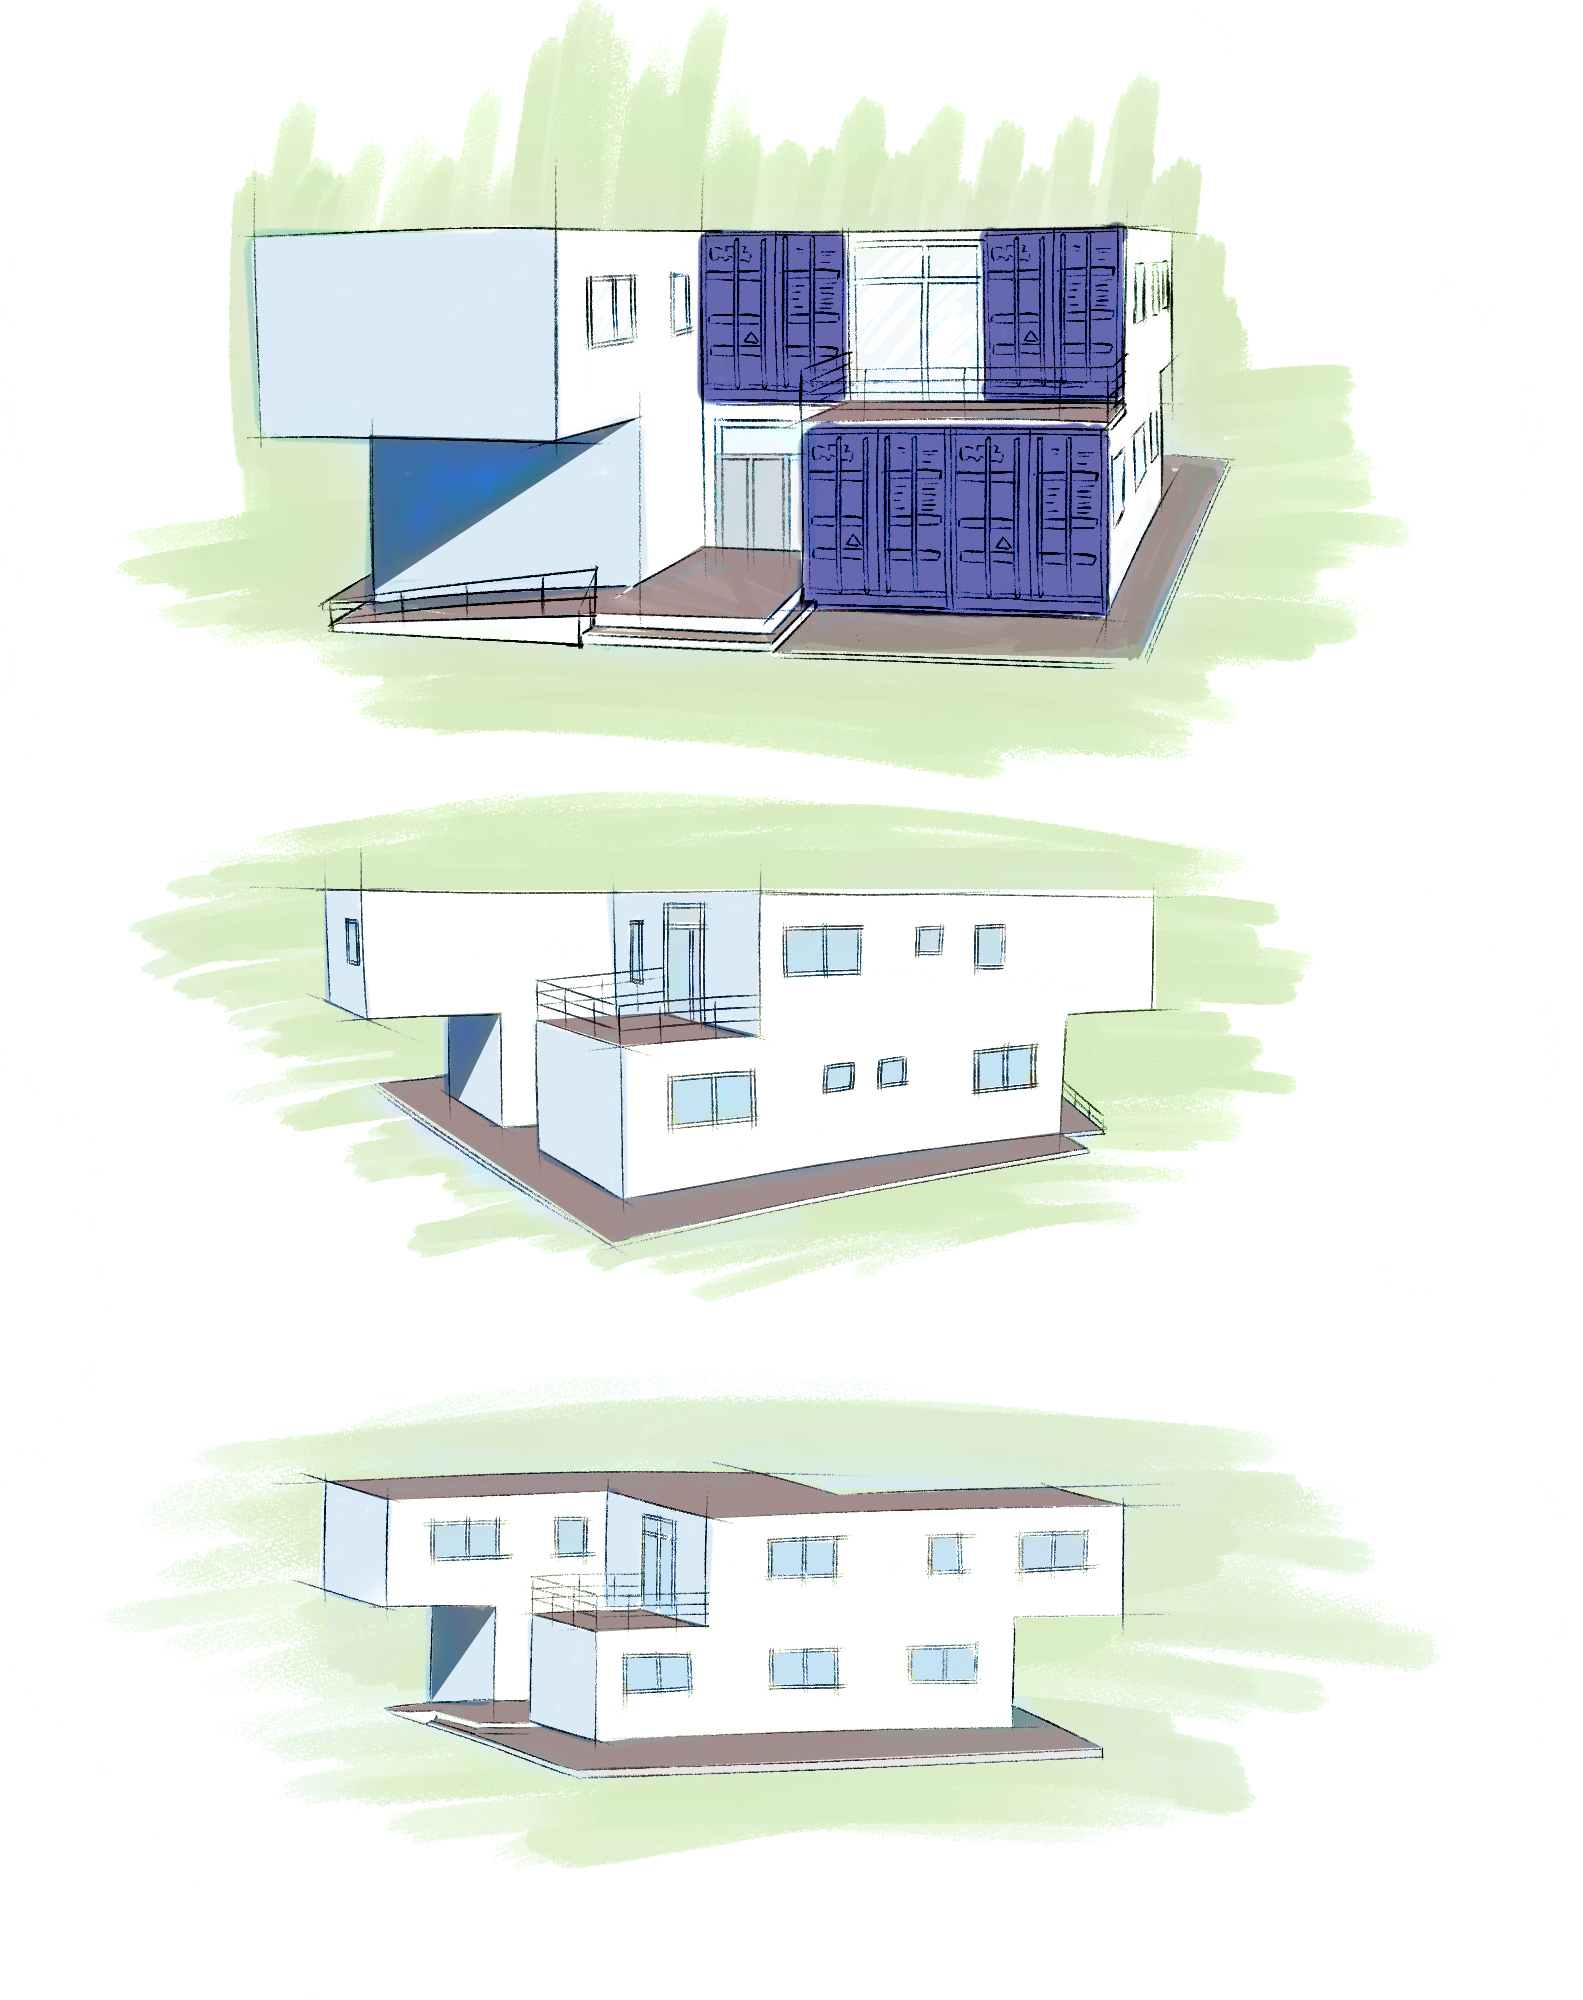 casa fabricada con cuatro contenedores maritimos